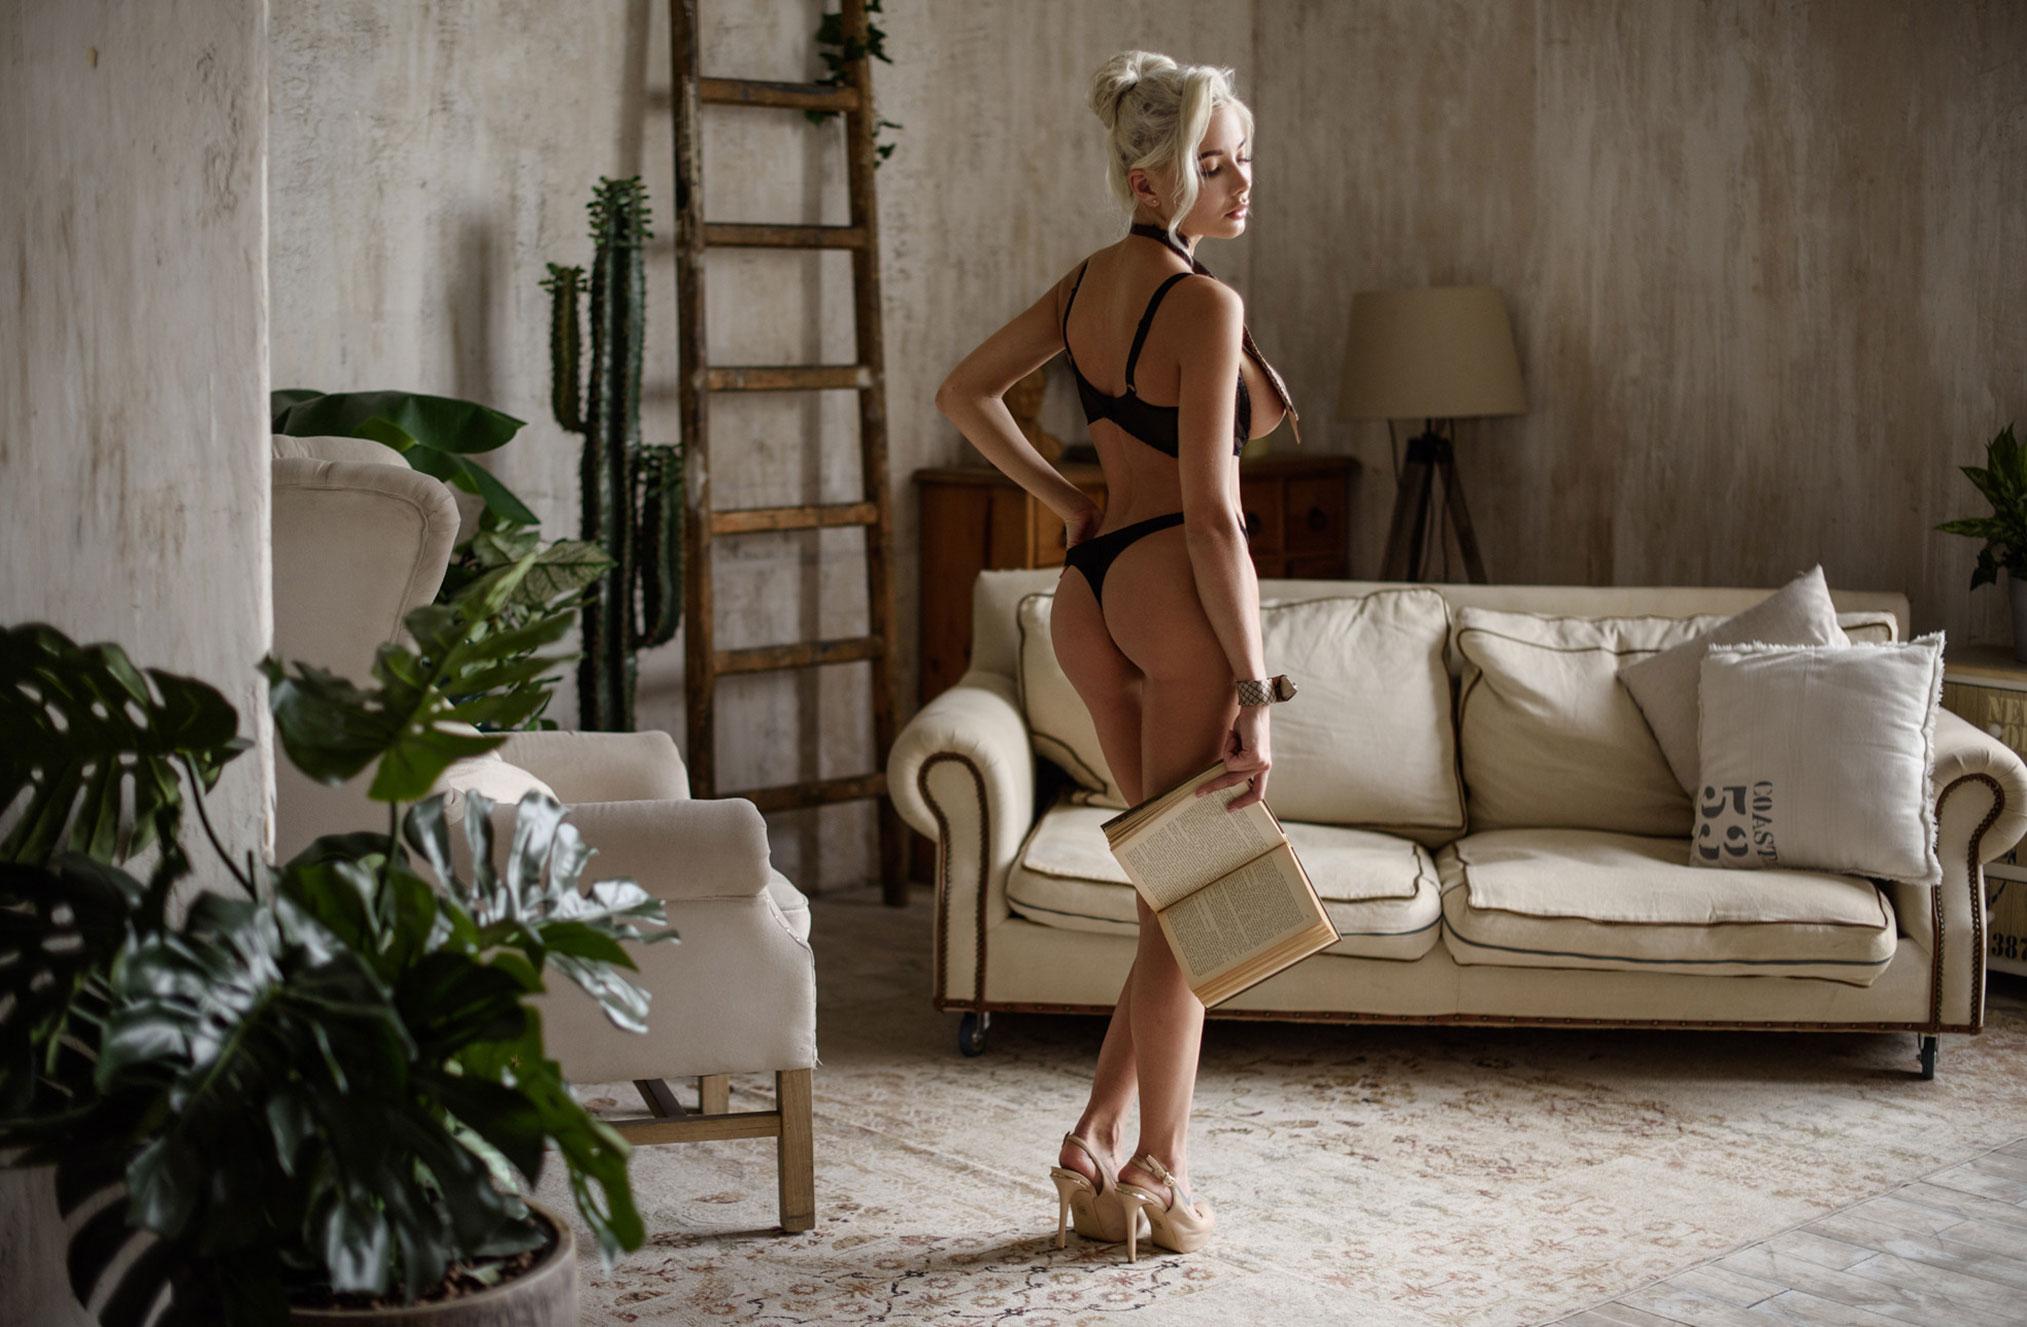 Екатерина Ширяева - голая, но в галстуке / фото 01